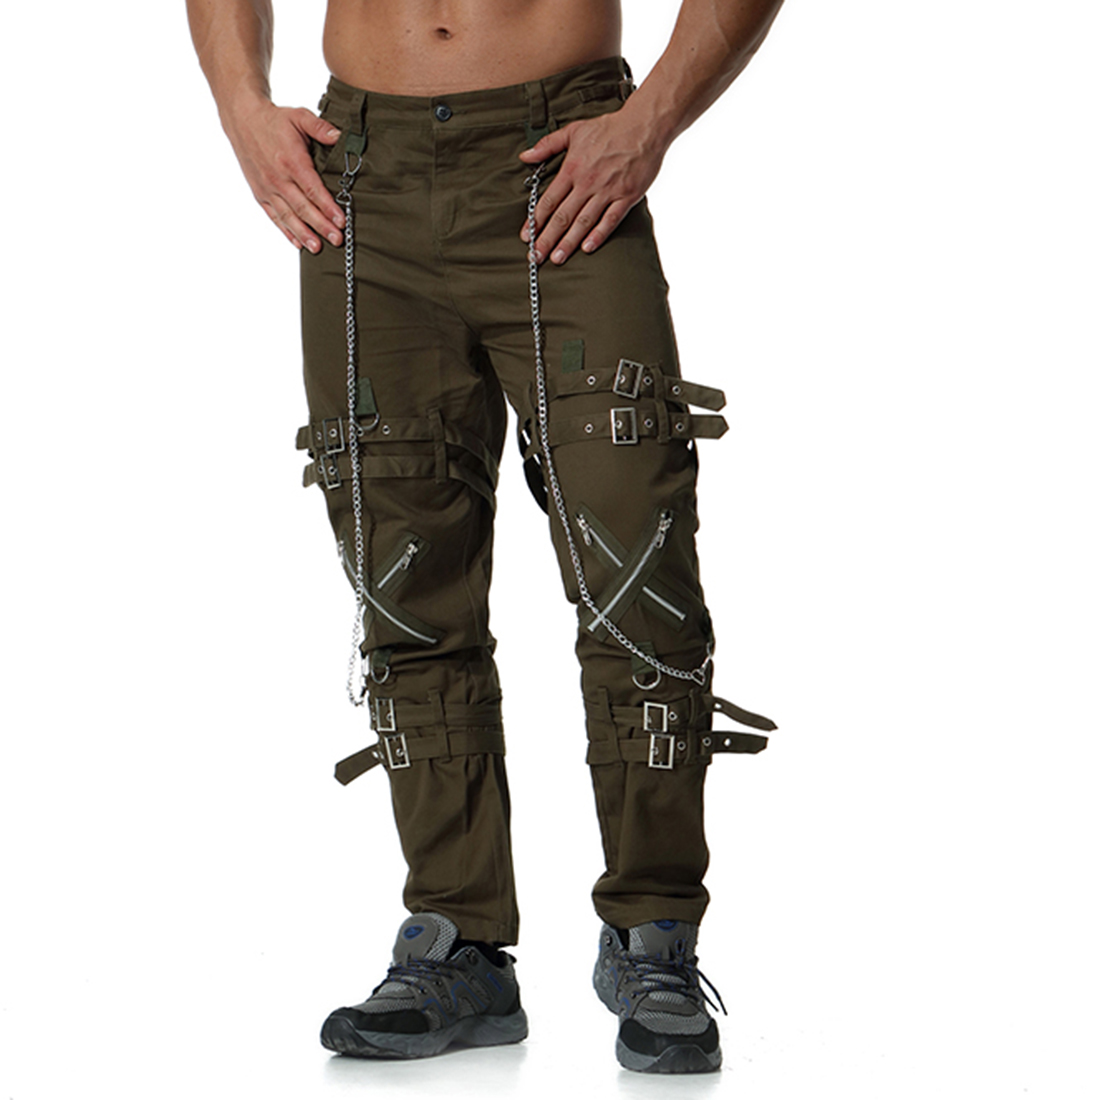 Pantalones para hombre, pantalones de chándal, pantalones de chándal, pantalones para hombre, hip hop, Camuflaje, pantalones tácticos de carga, Militar - 3